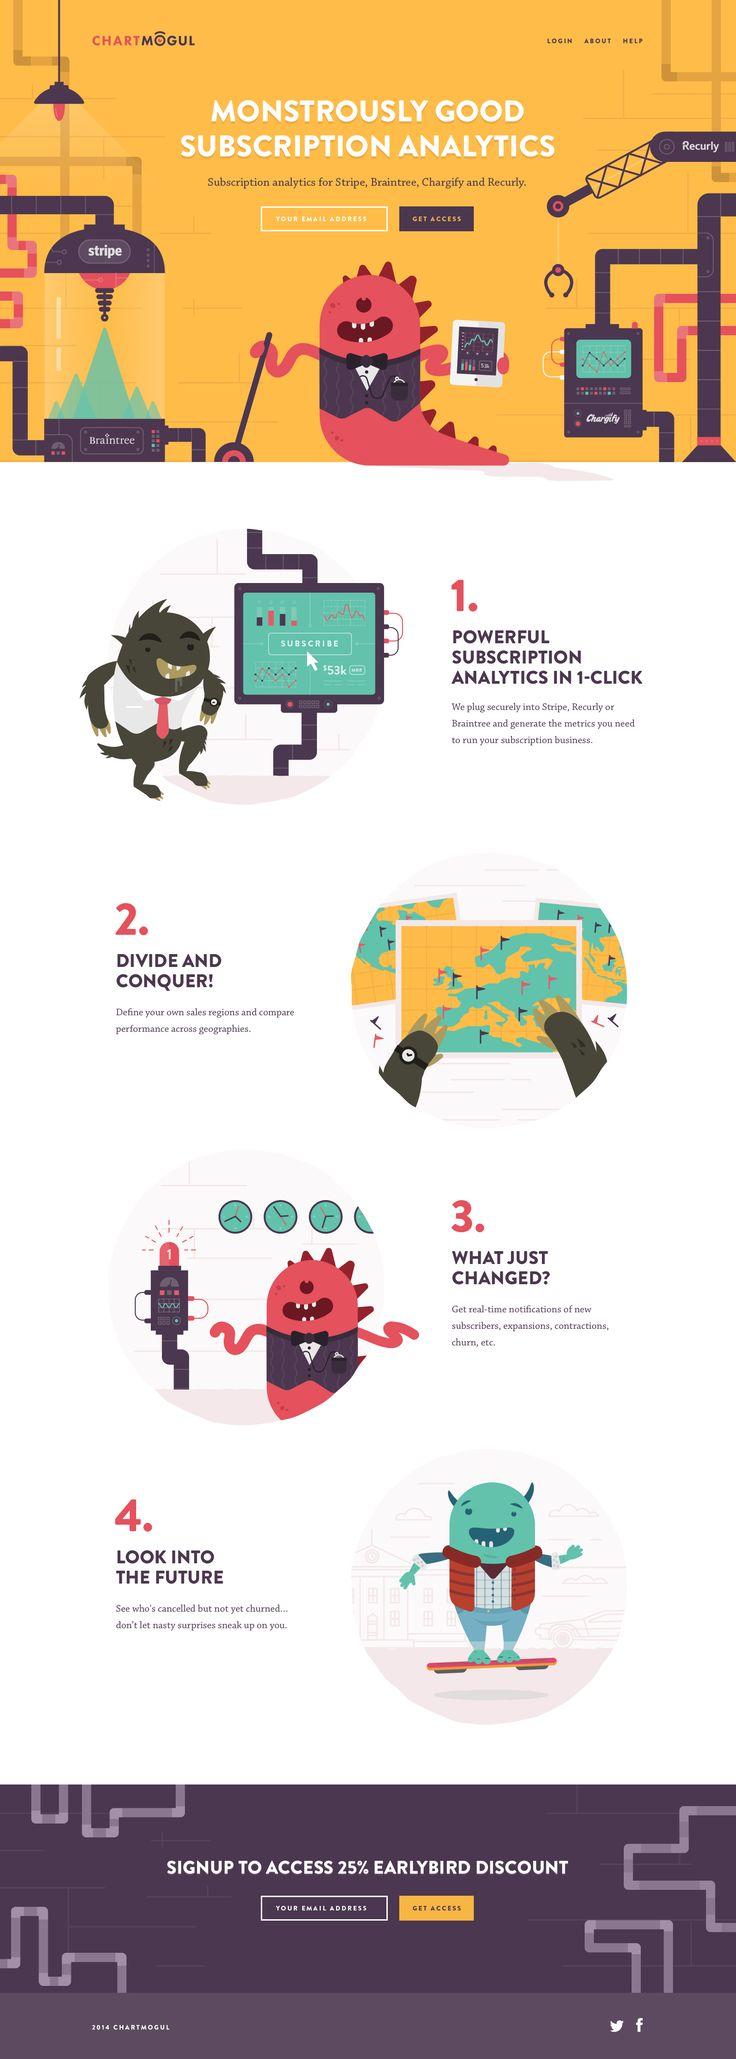 Unique Web Design, Chart Mogul #WebDesign #Design (http://www.pinterest.com/aldenchong/)